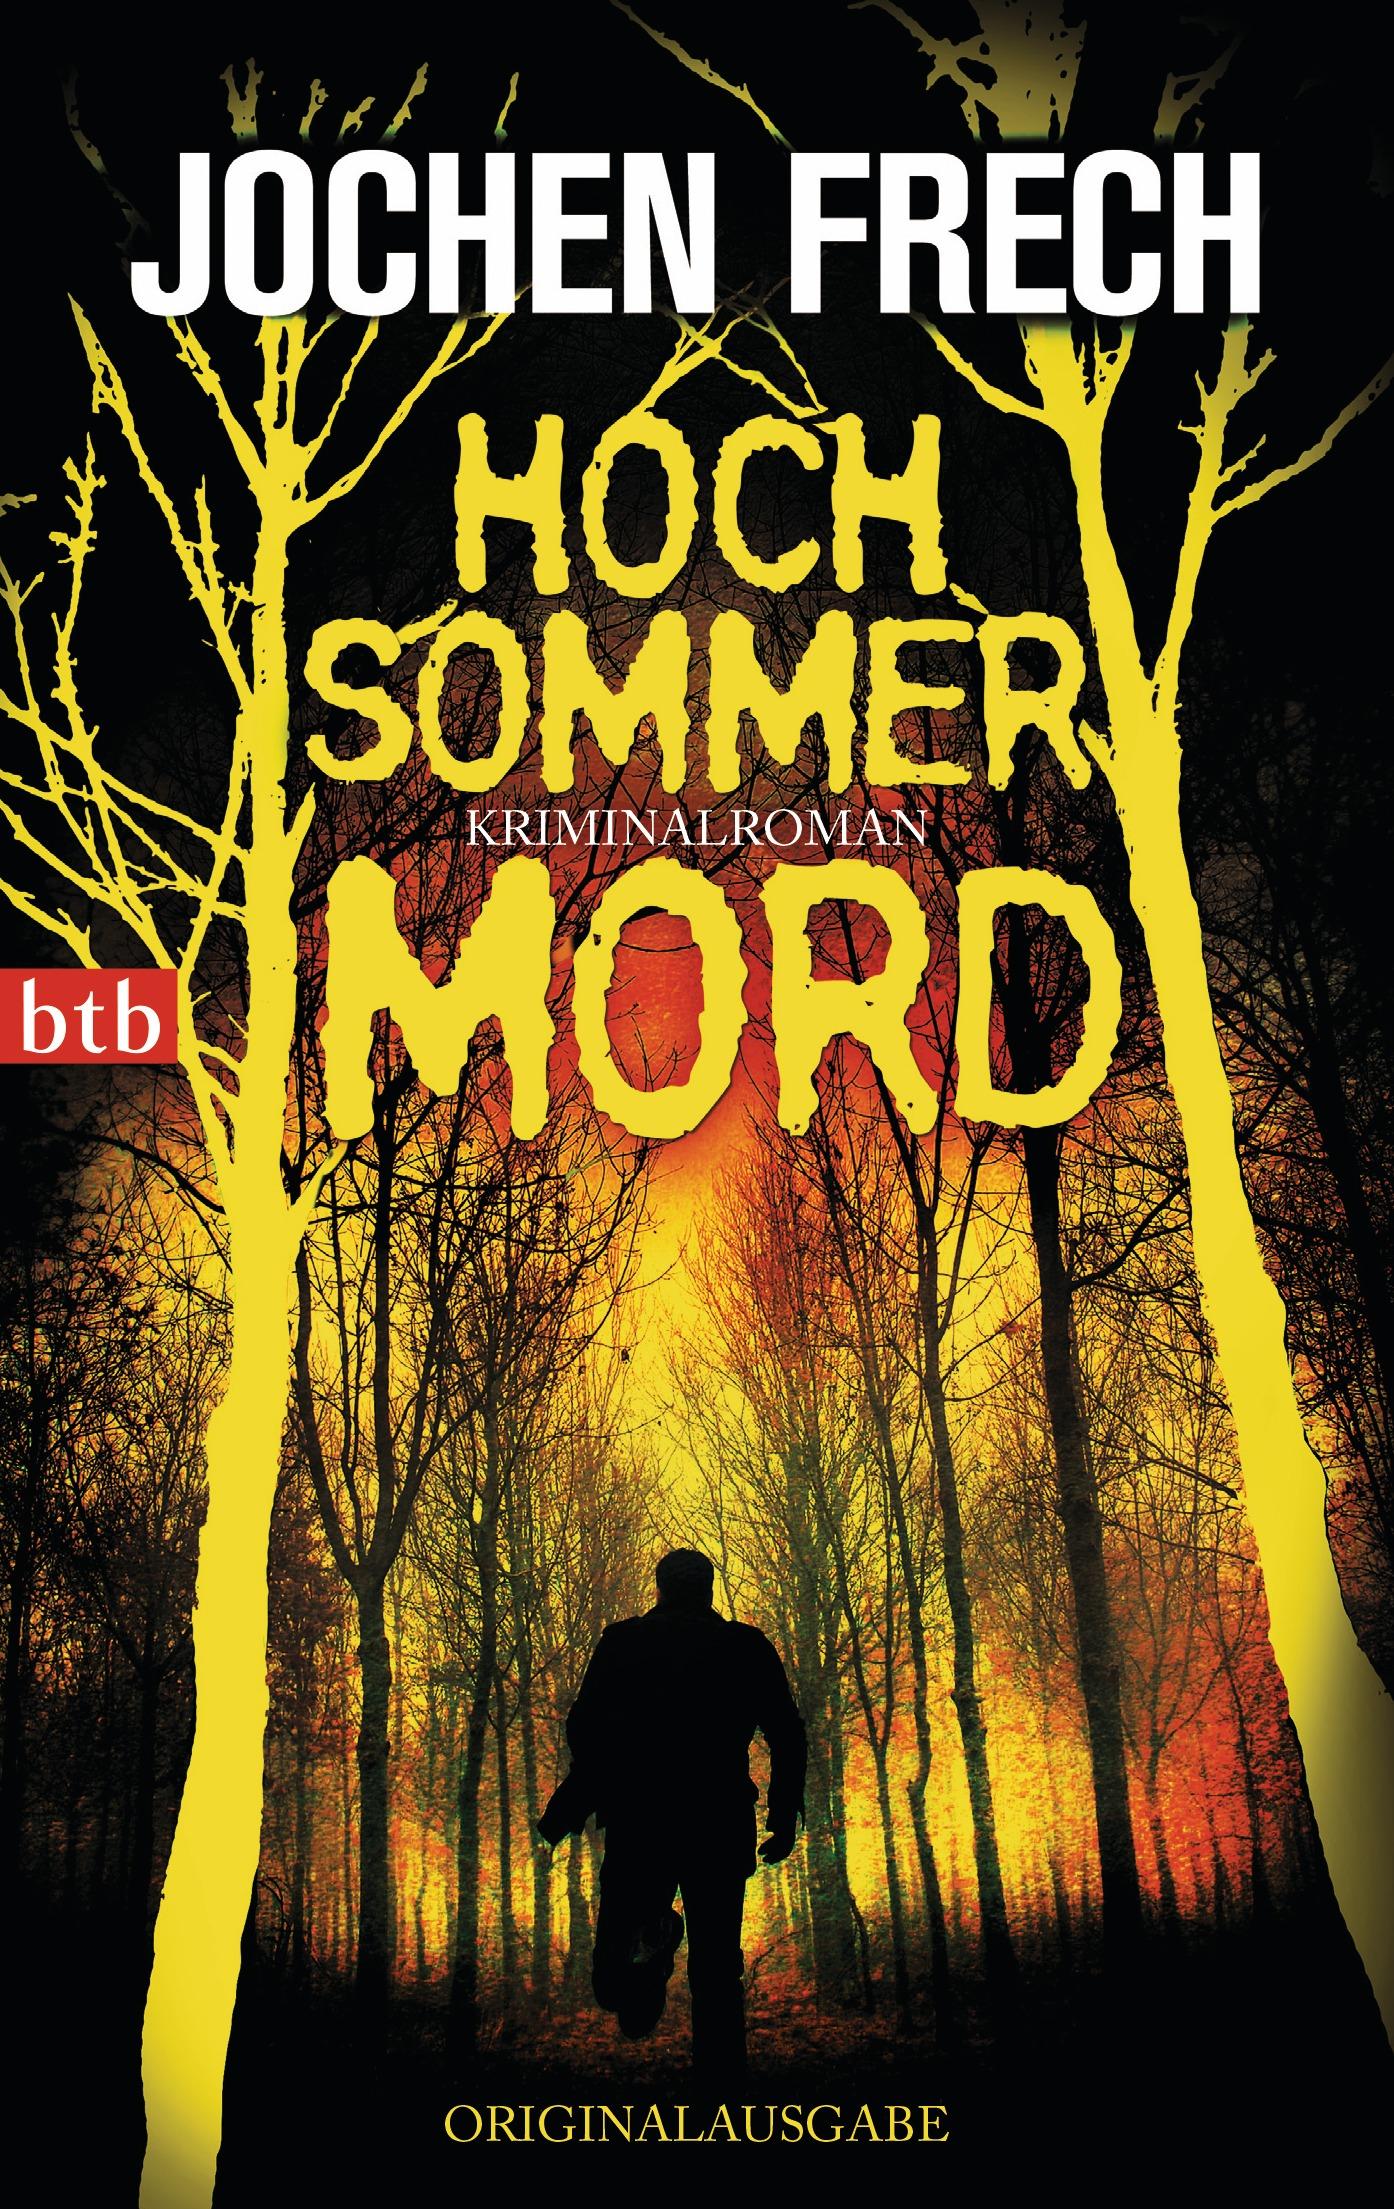 Hochsommermord - Jochen Frech